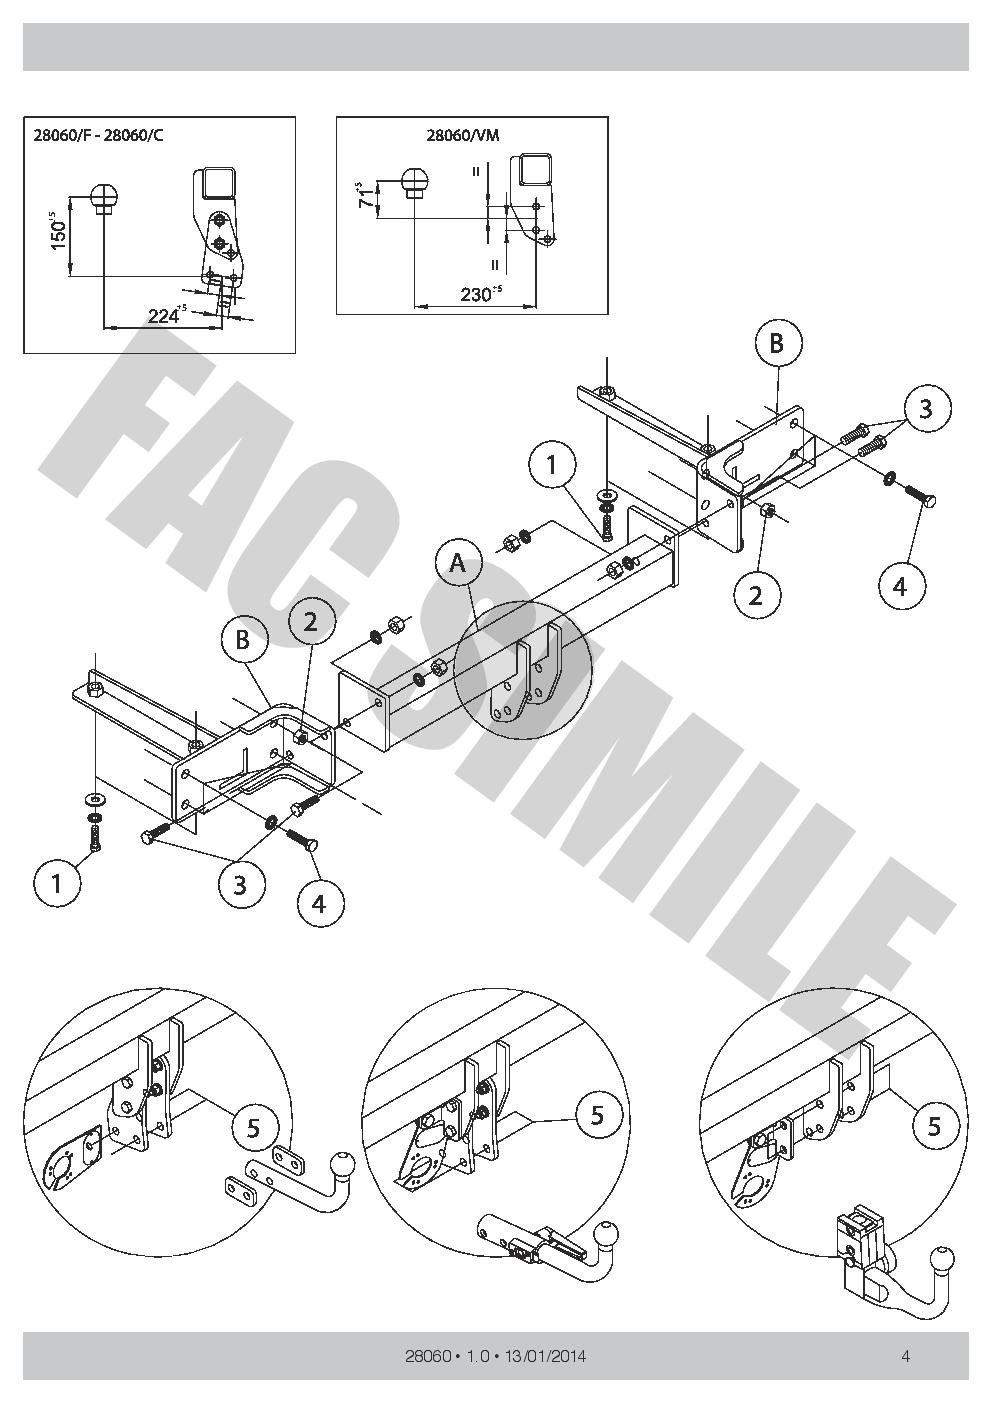 detachable towbar + 7pin wiring for opel vauxhall meriva-b ... vauxhall antara towbar wiring diagram vauxhall vectra c towbar wiring diagram #9